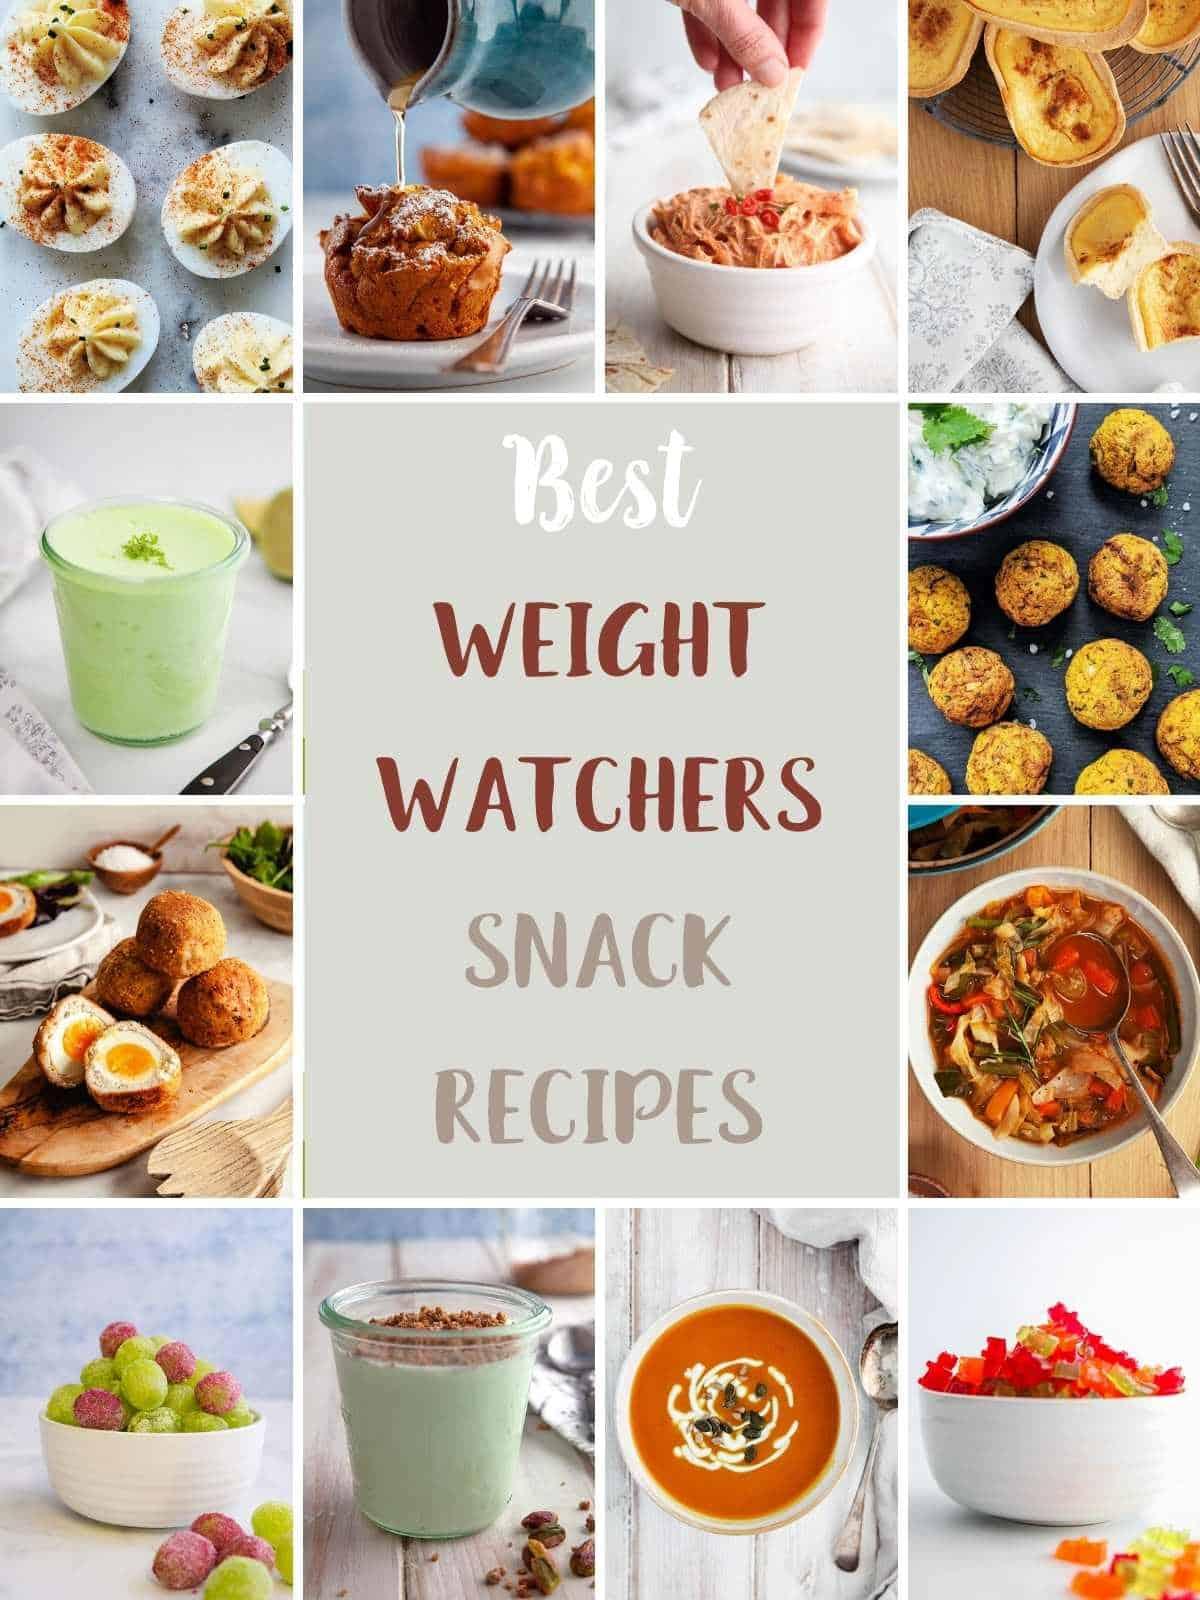 12 Best Ww Snack Recipes Pointed Kitchen